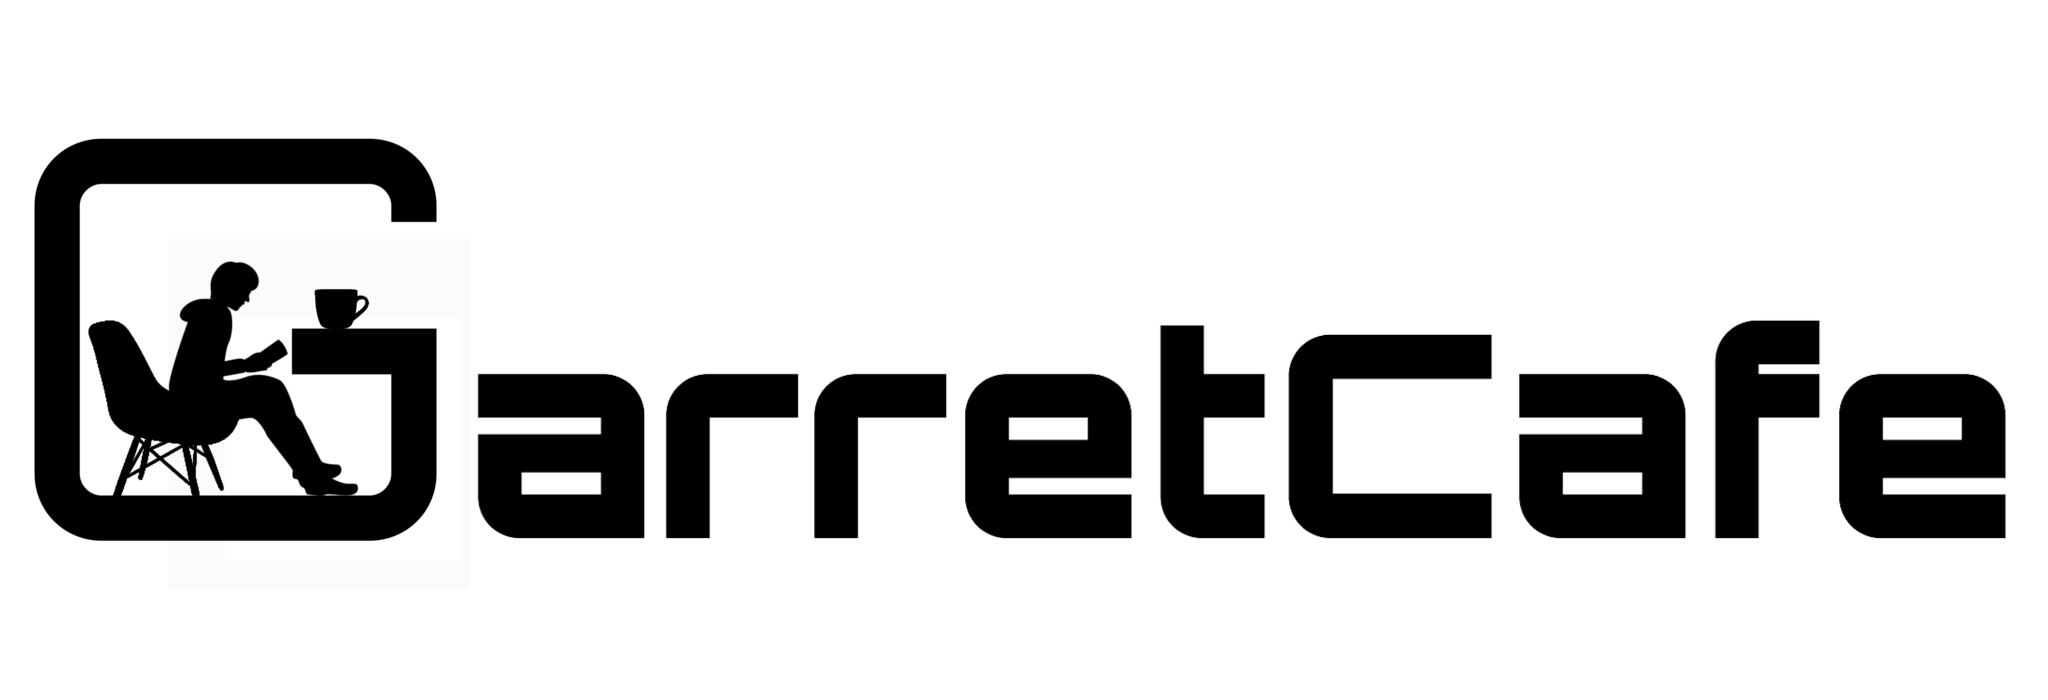 GarretCafe